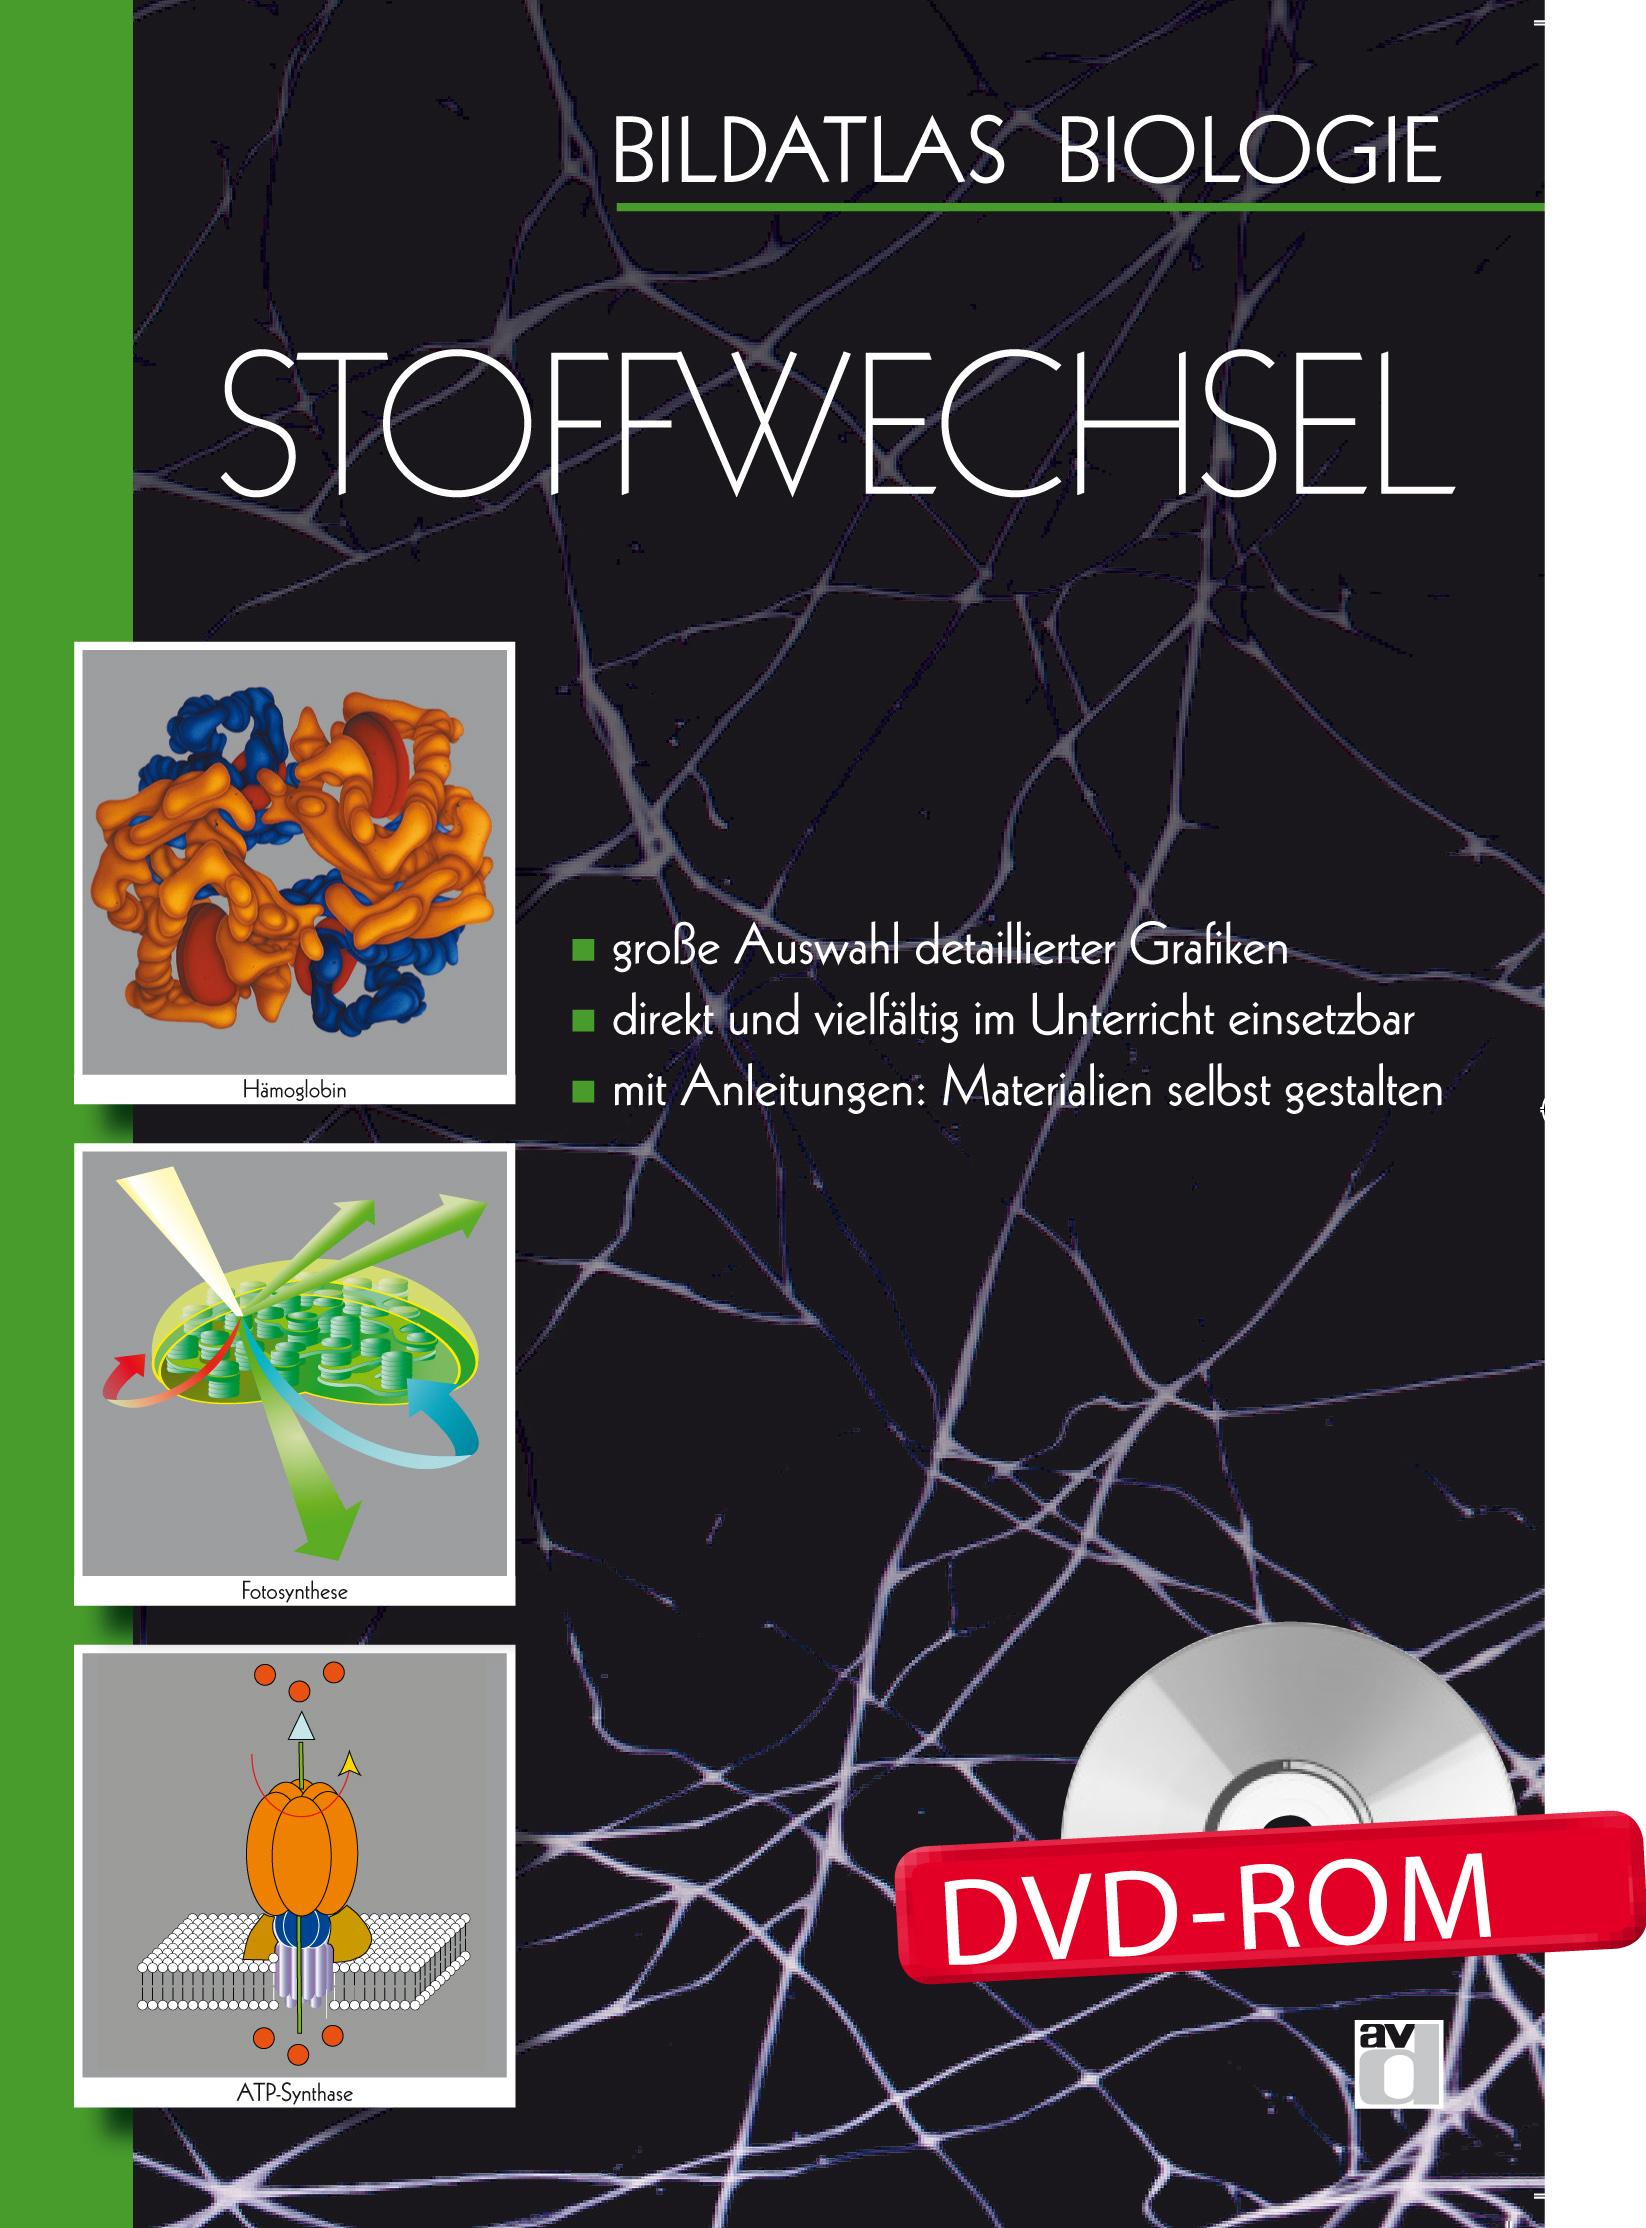 Bildatlas Biologie – DVD 4